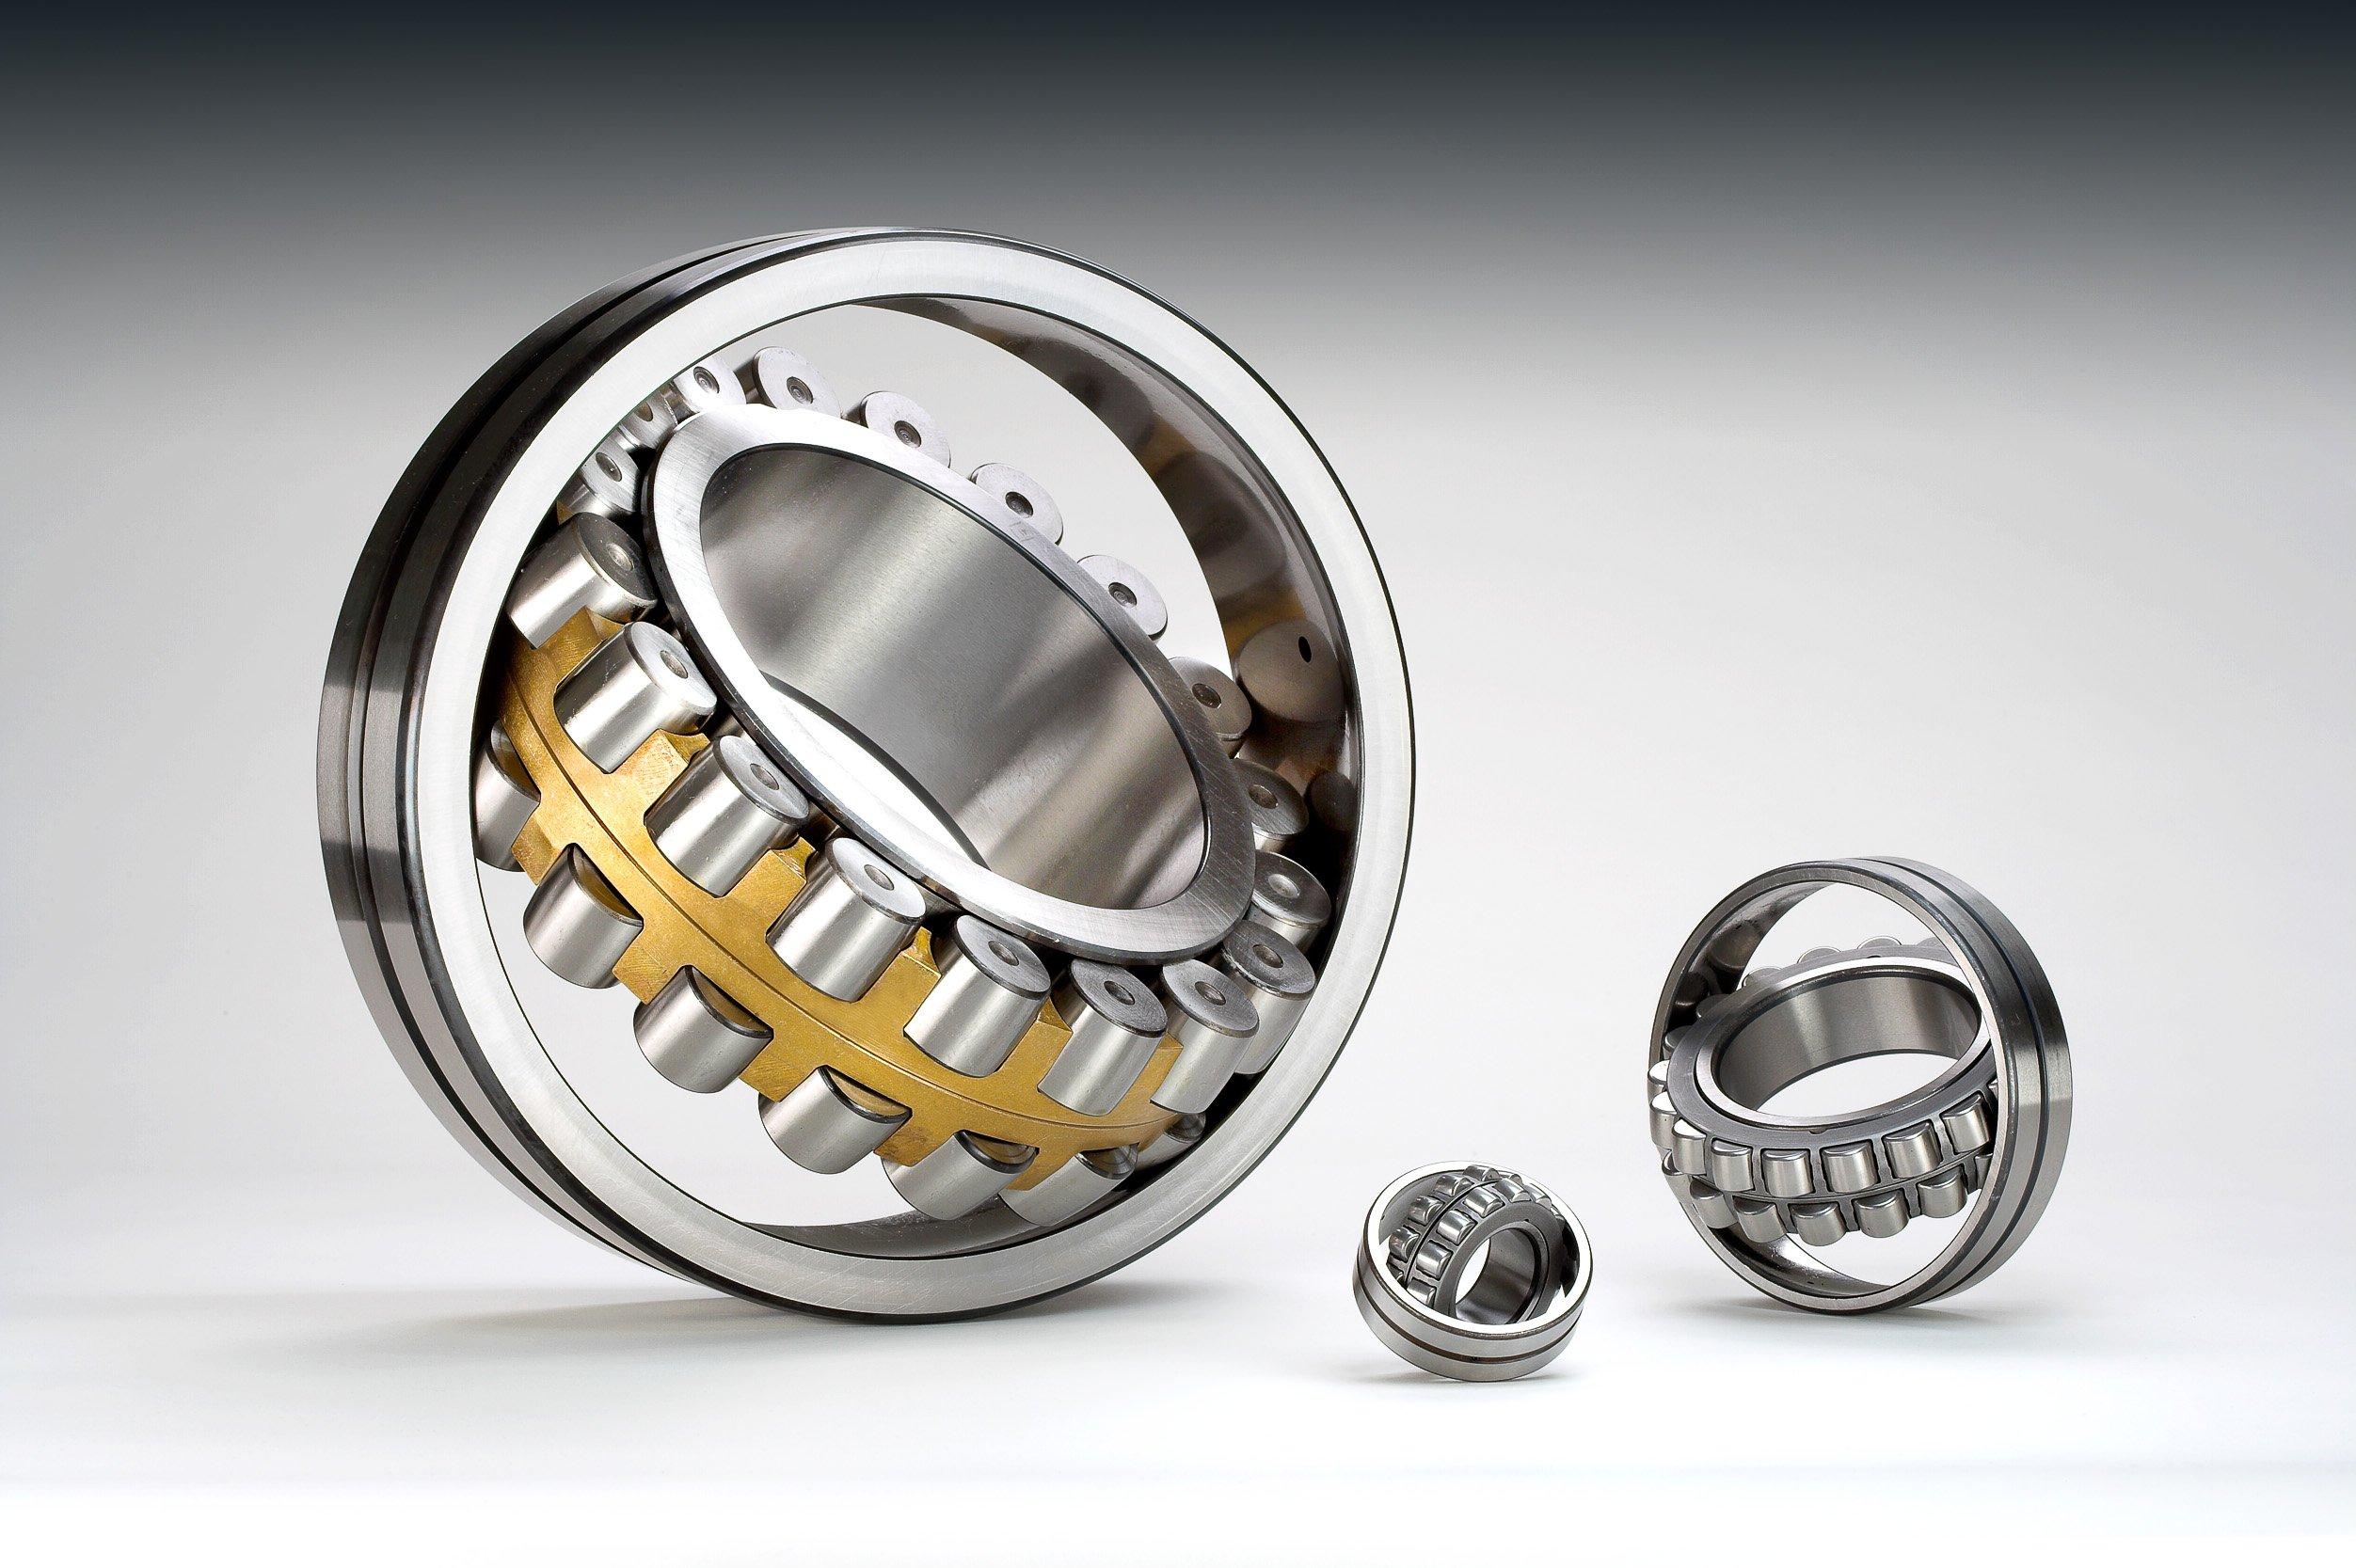 3ball_bearing_metal_steel_mechanics_technics_machine_round_circle_industrial_2504x1667